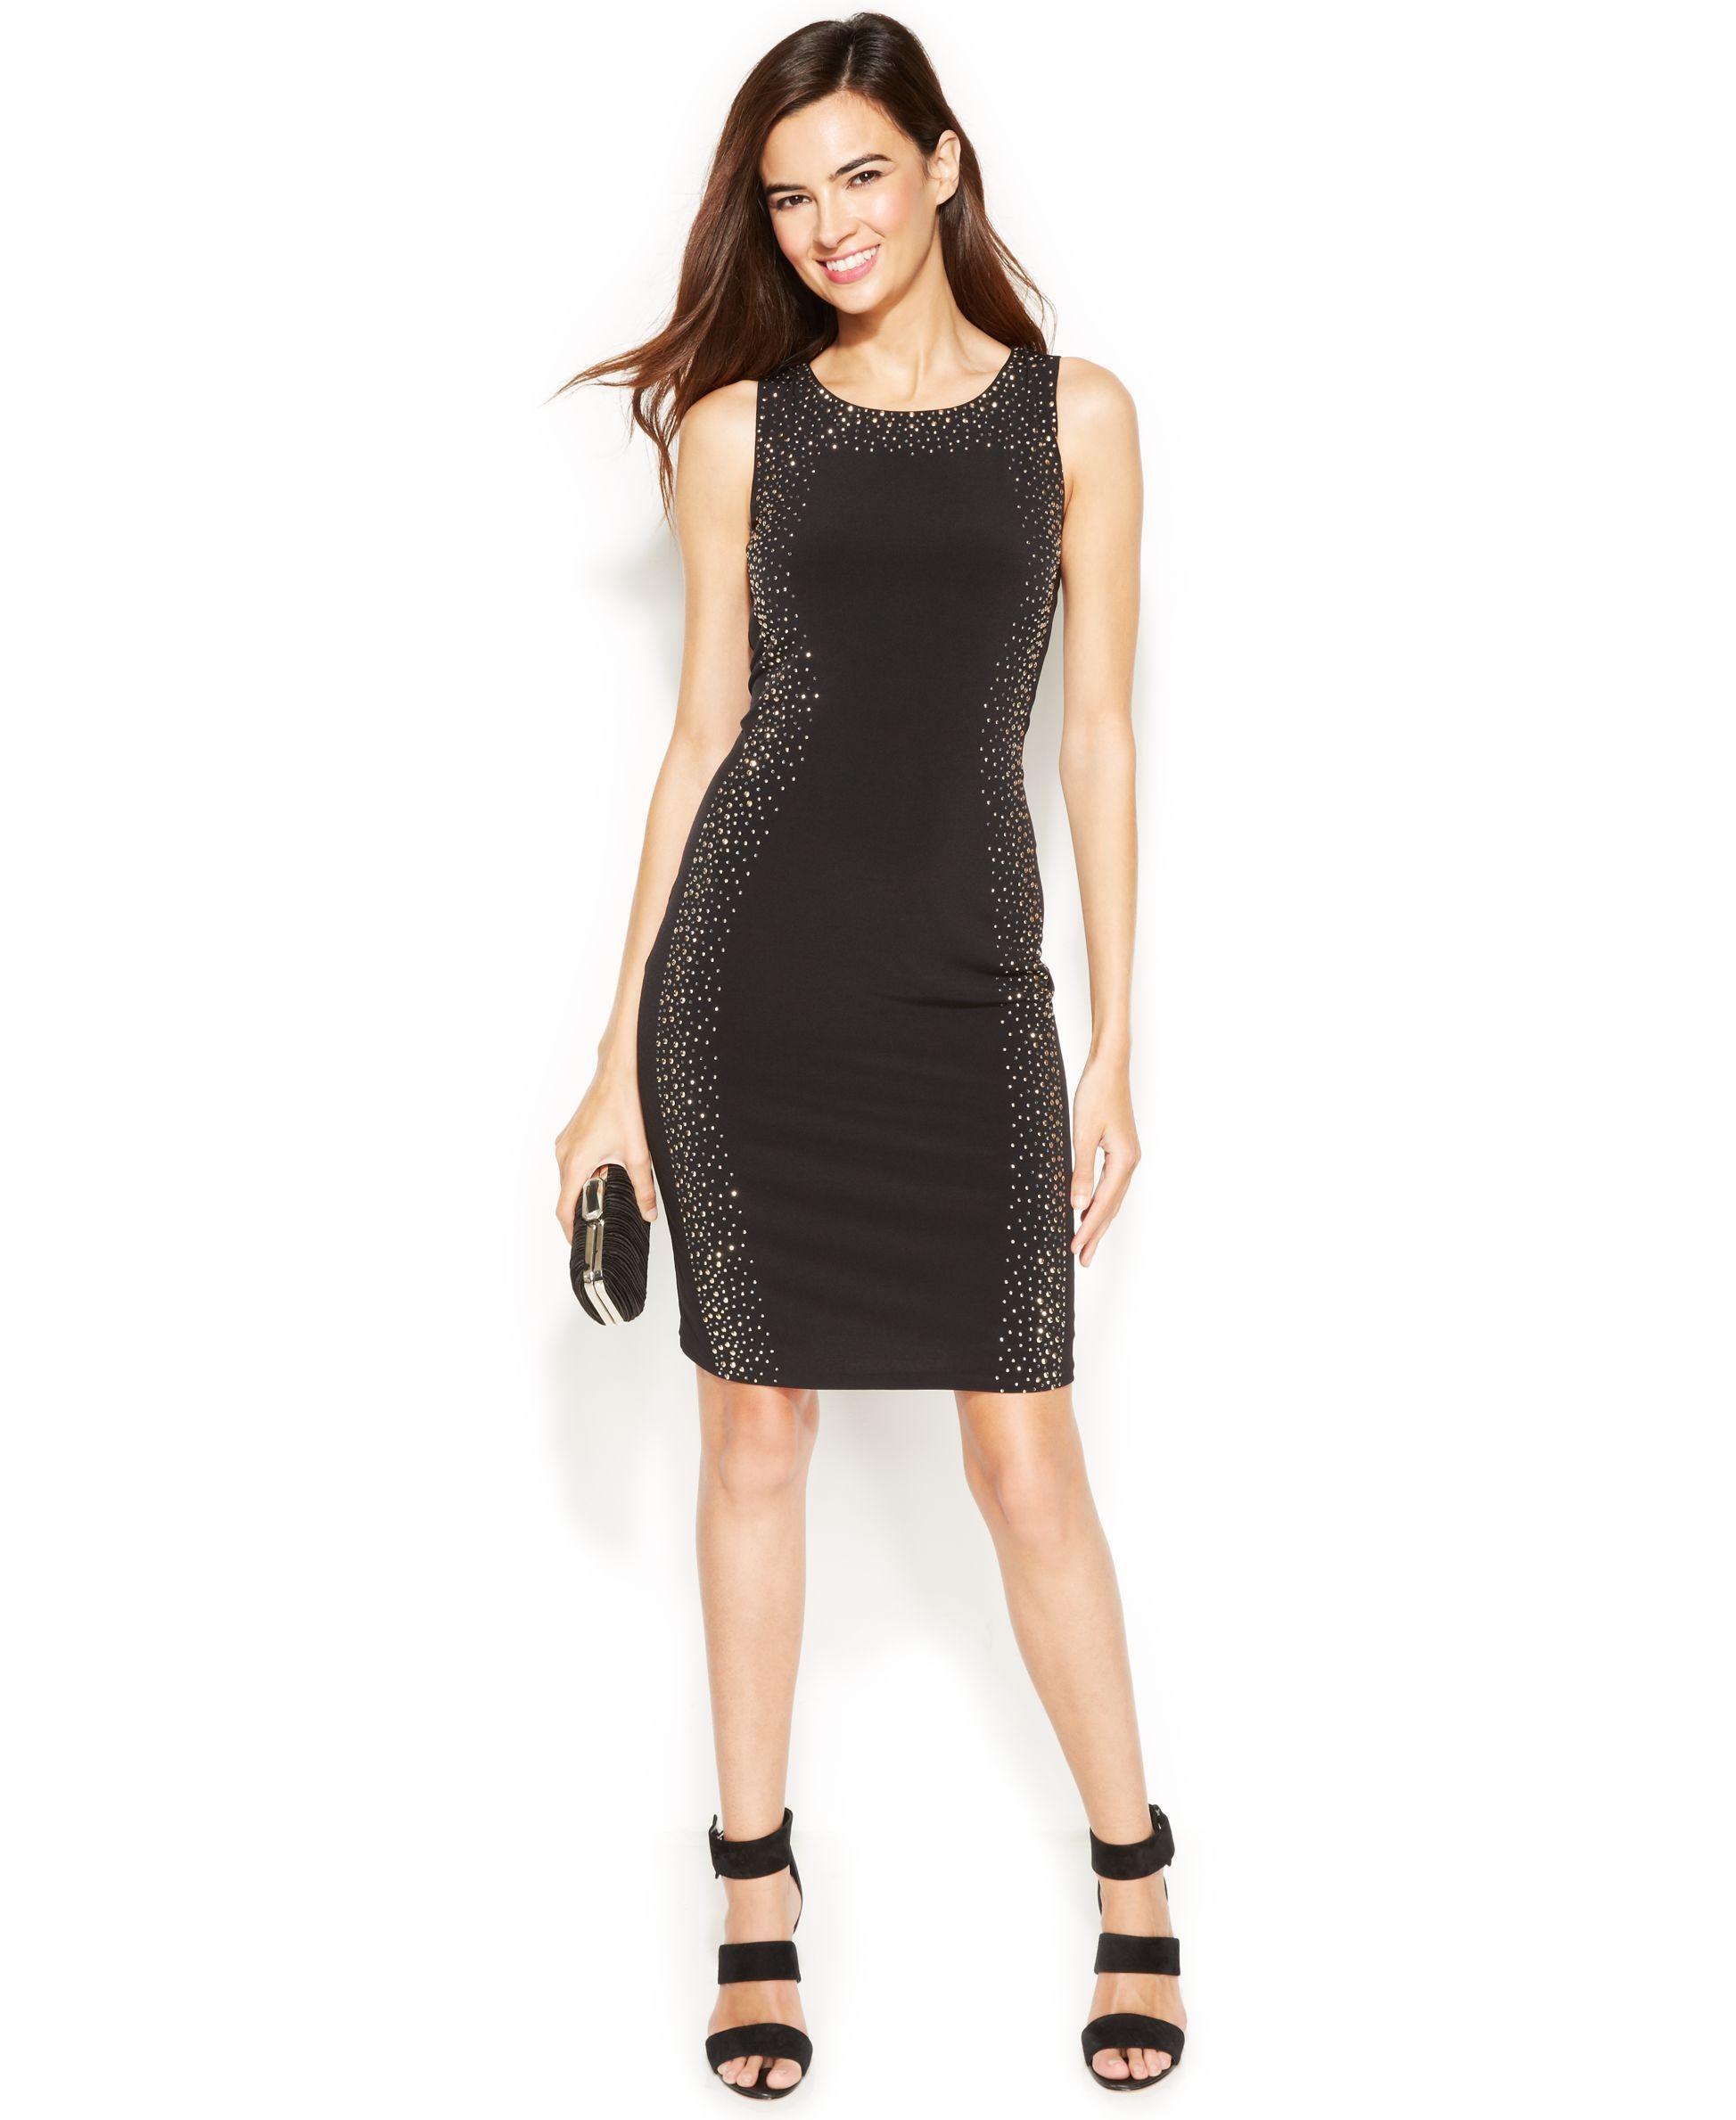 feb3c290 Calvin Klein Sleeveless Studded Body-Con Dress   Products   Dresses ...